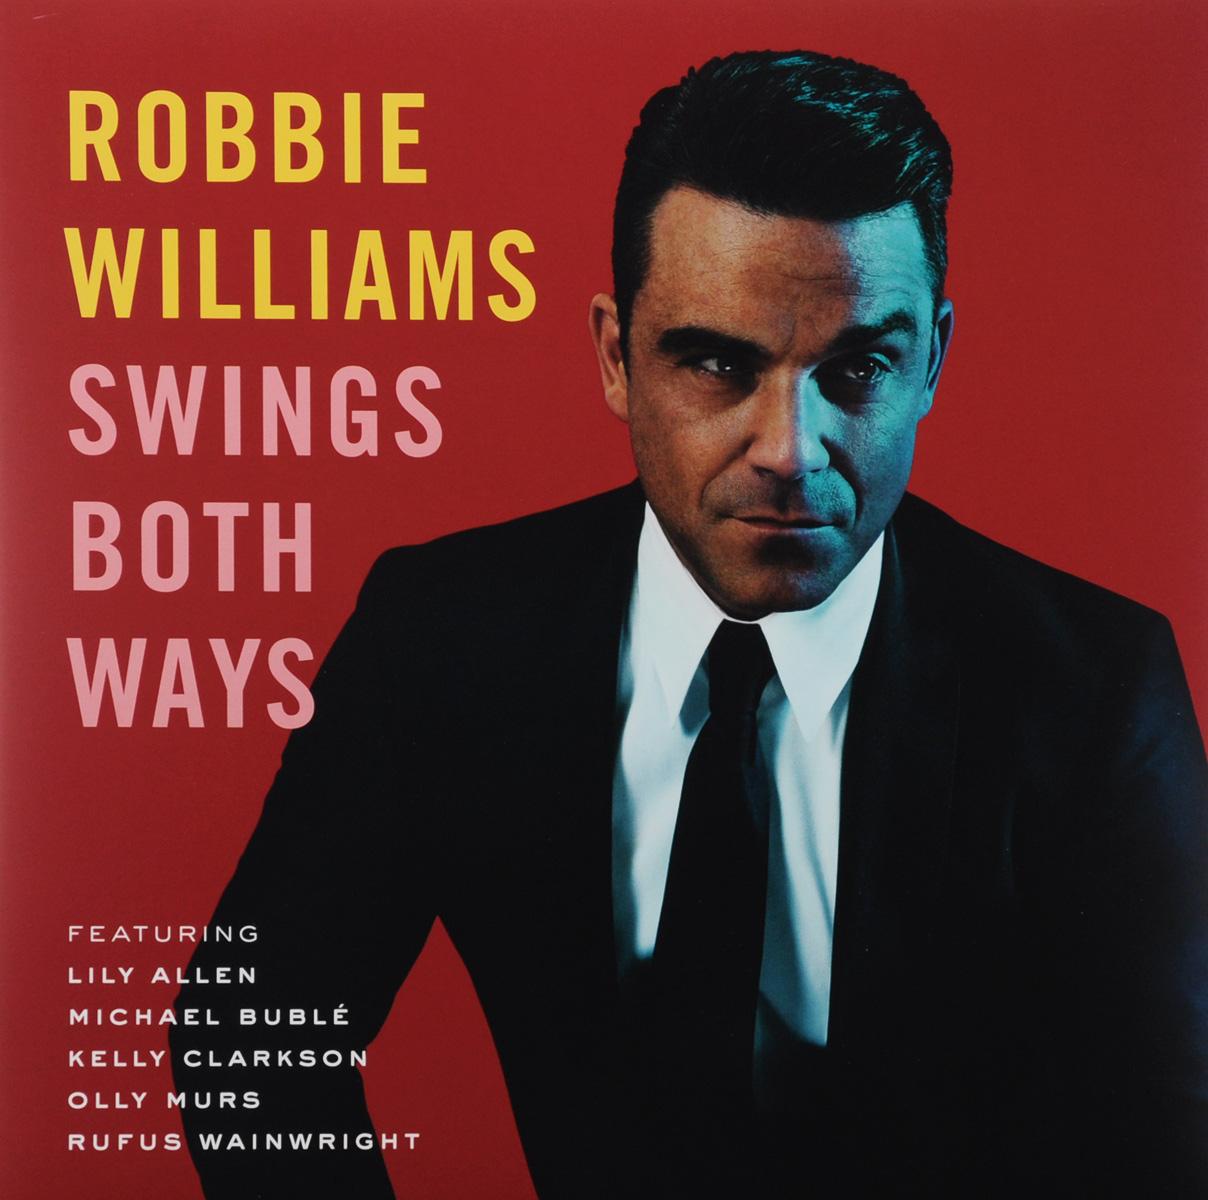 Робби Уильямс Robbie Williams. Swings Both Ways. Limited Edition (2 LP) cd robbie williams heavy entertainment show